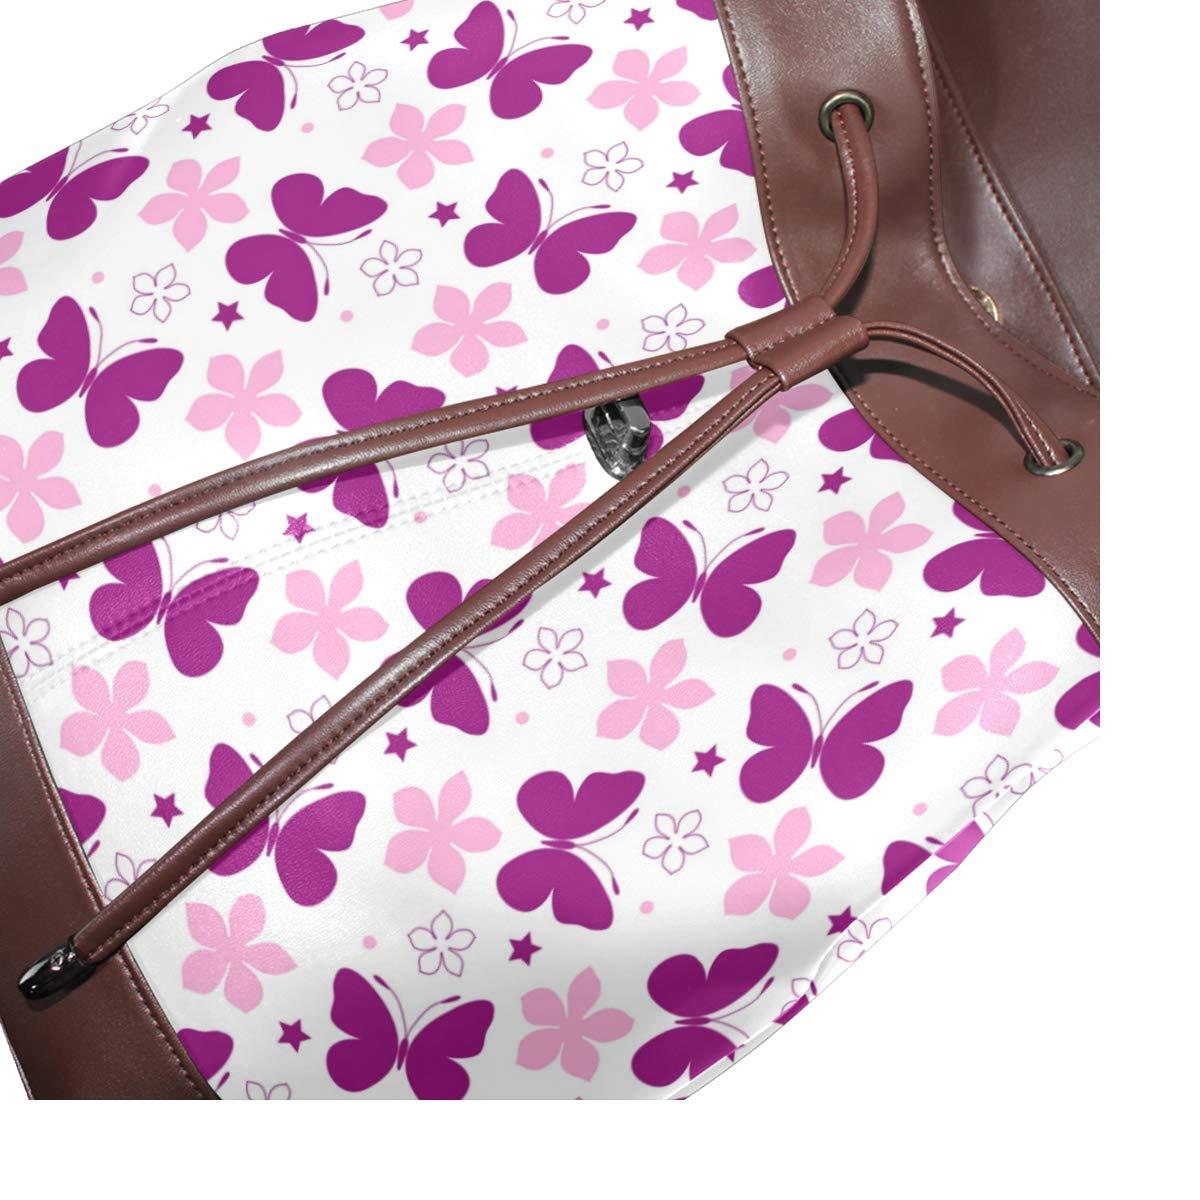 Butterfly Backpack PU Leather School Shoulder Bag Rucksack for Women Girls Ladies Backpack Travel Bag